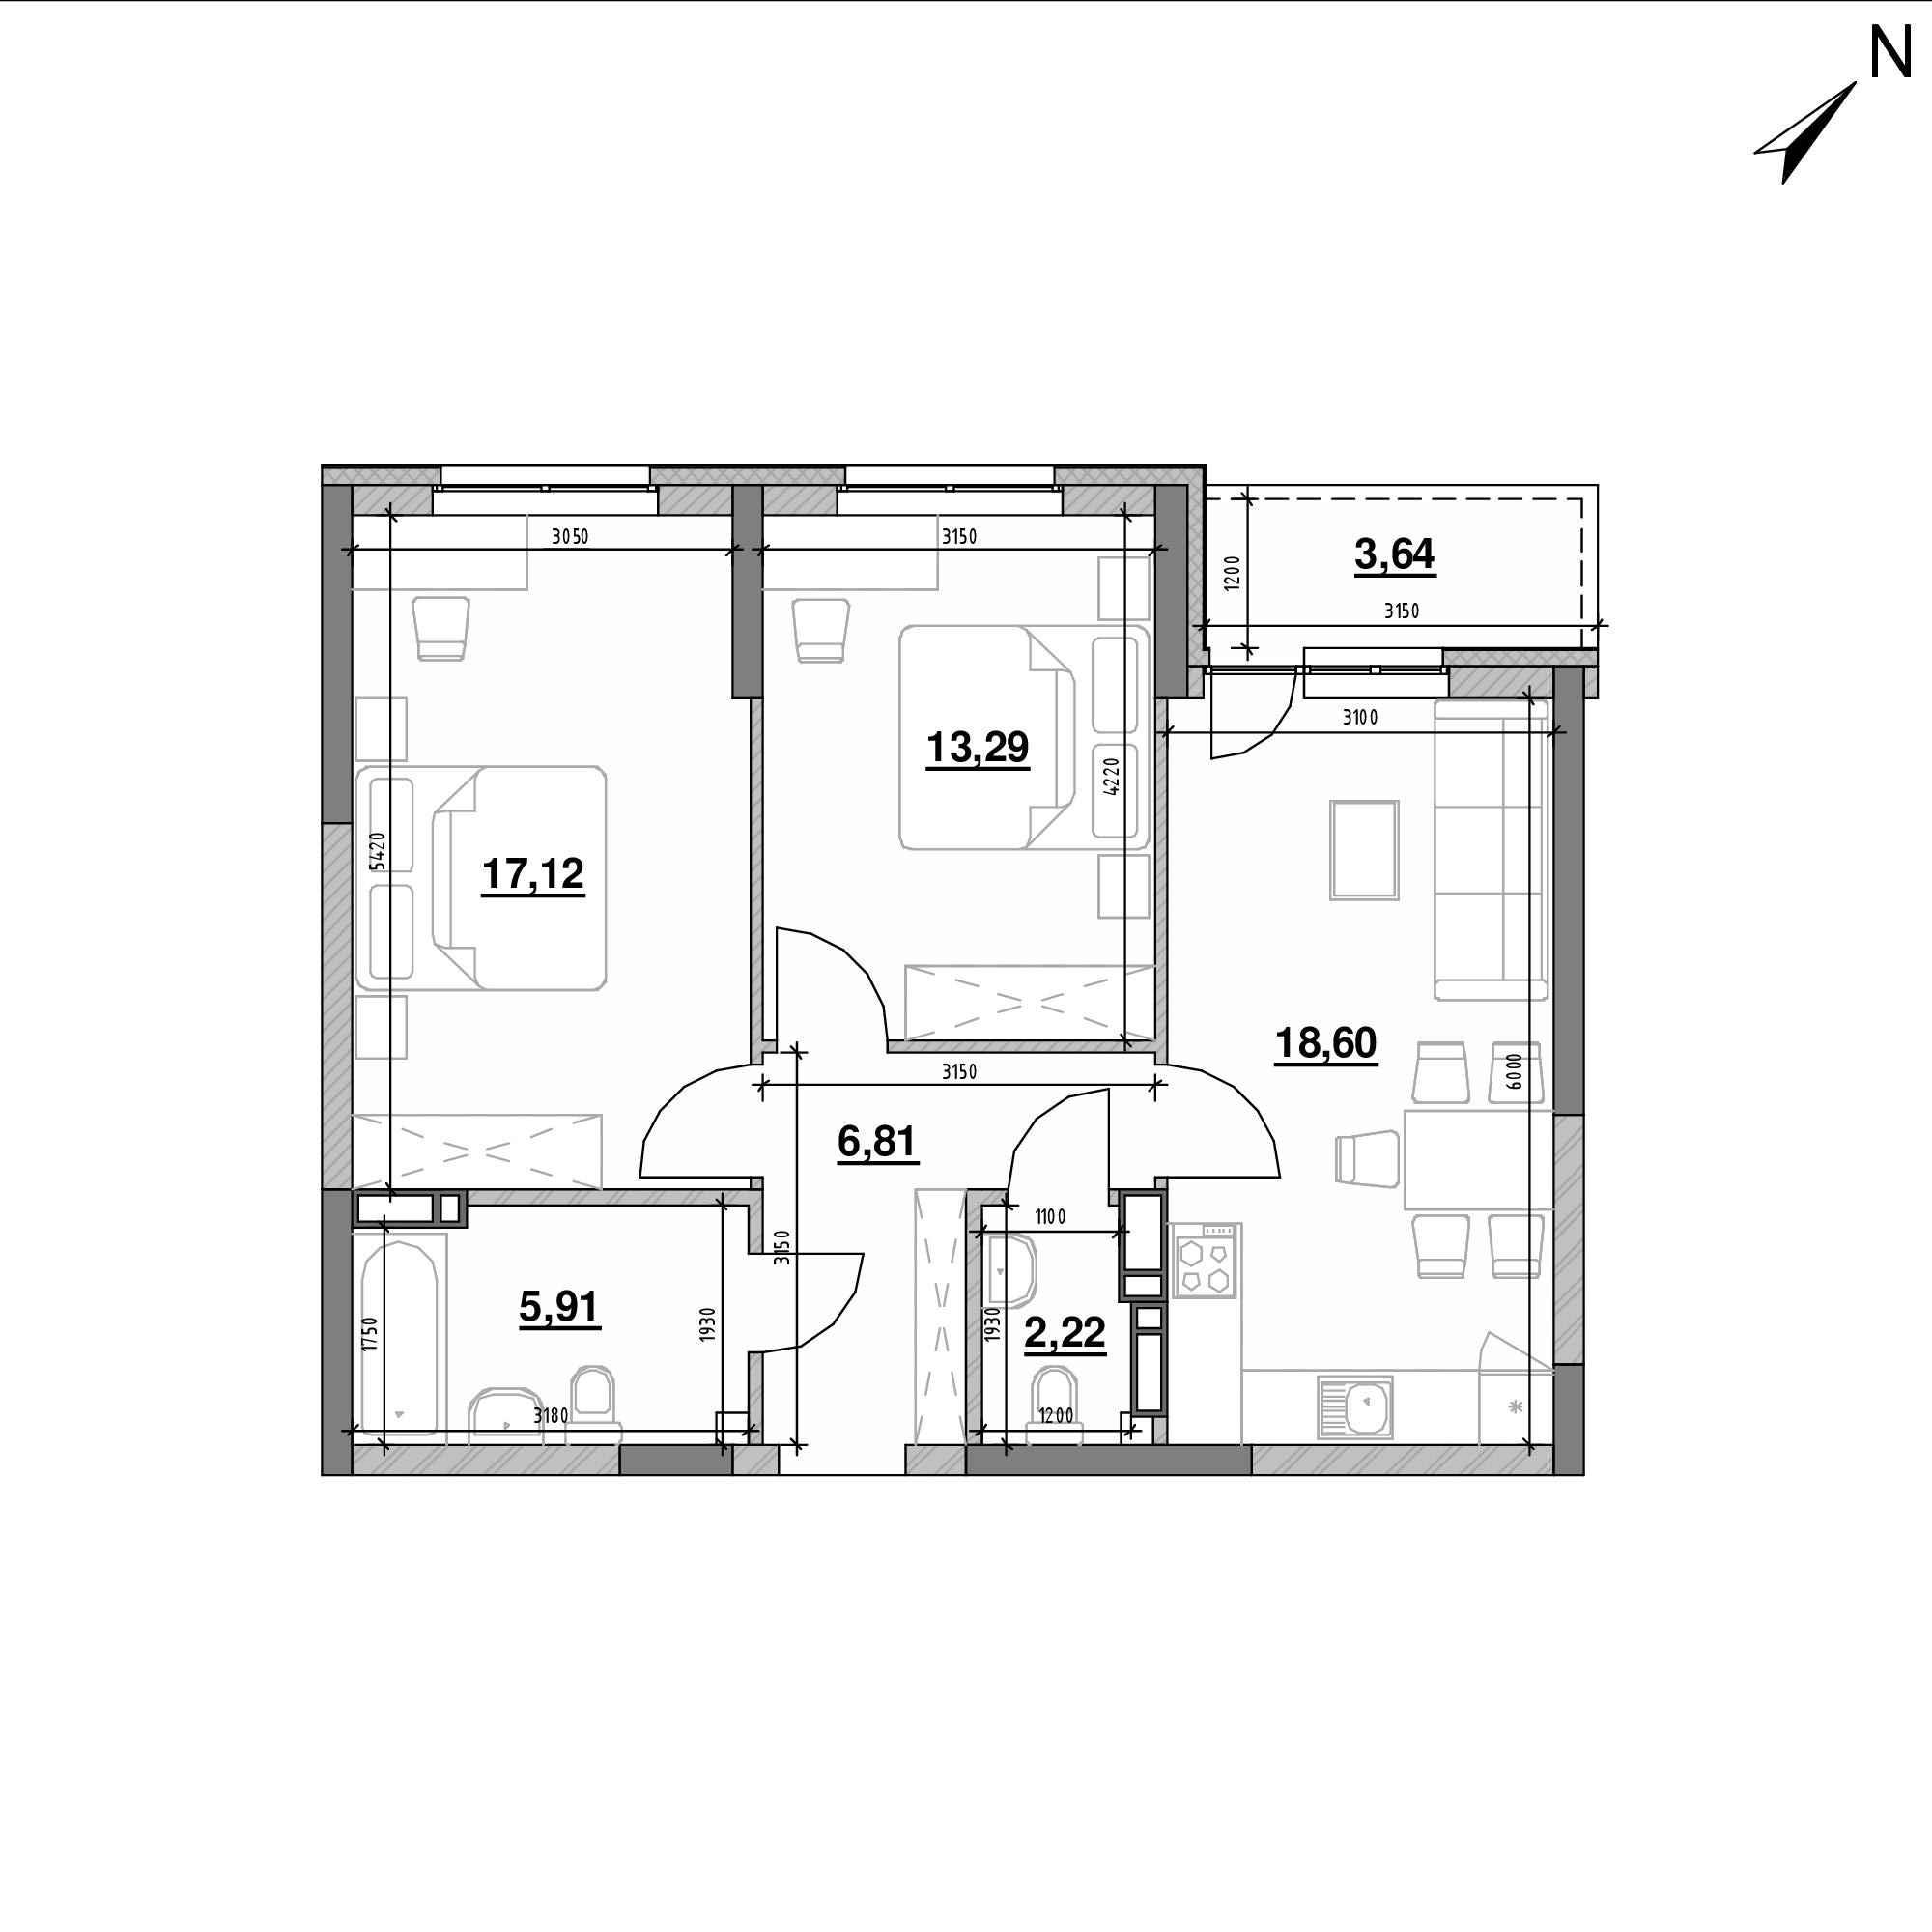 ЖК Оk'Land: планування 2-кімнатної квартири, №490, 67.59 м<sup>2</sup>